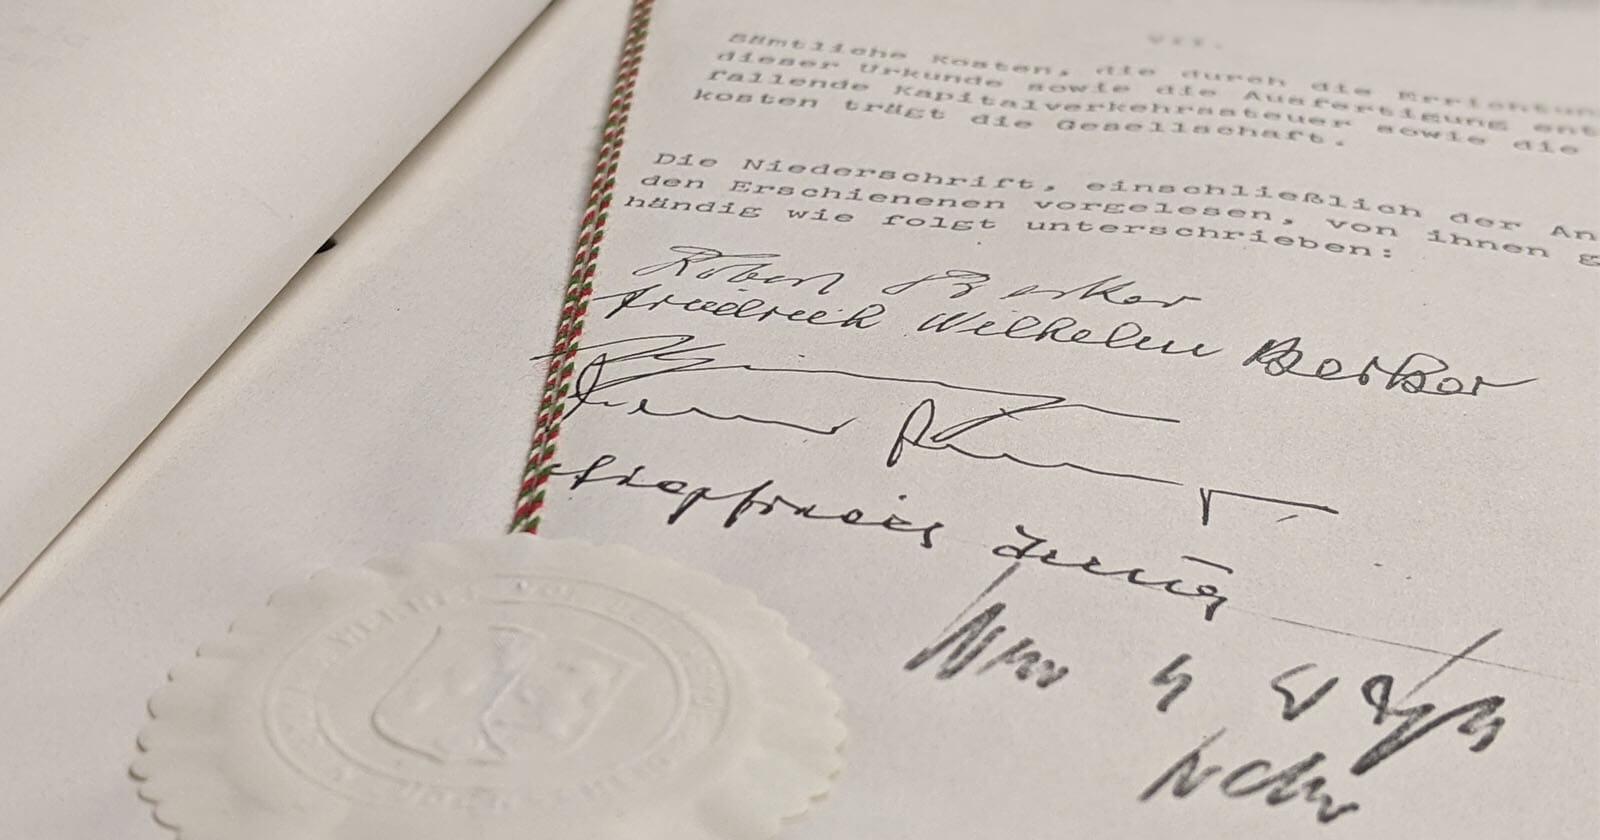 Schriftgut Notariatsurkunde Insta Gründung Unterschriften